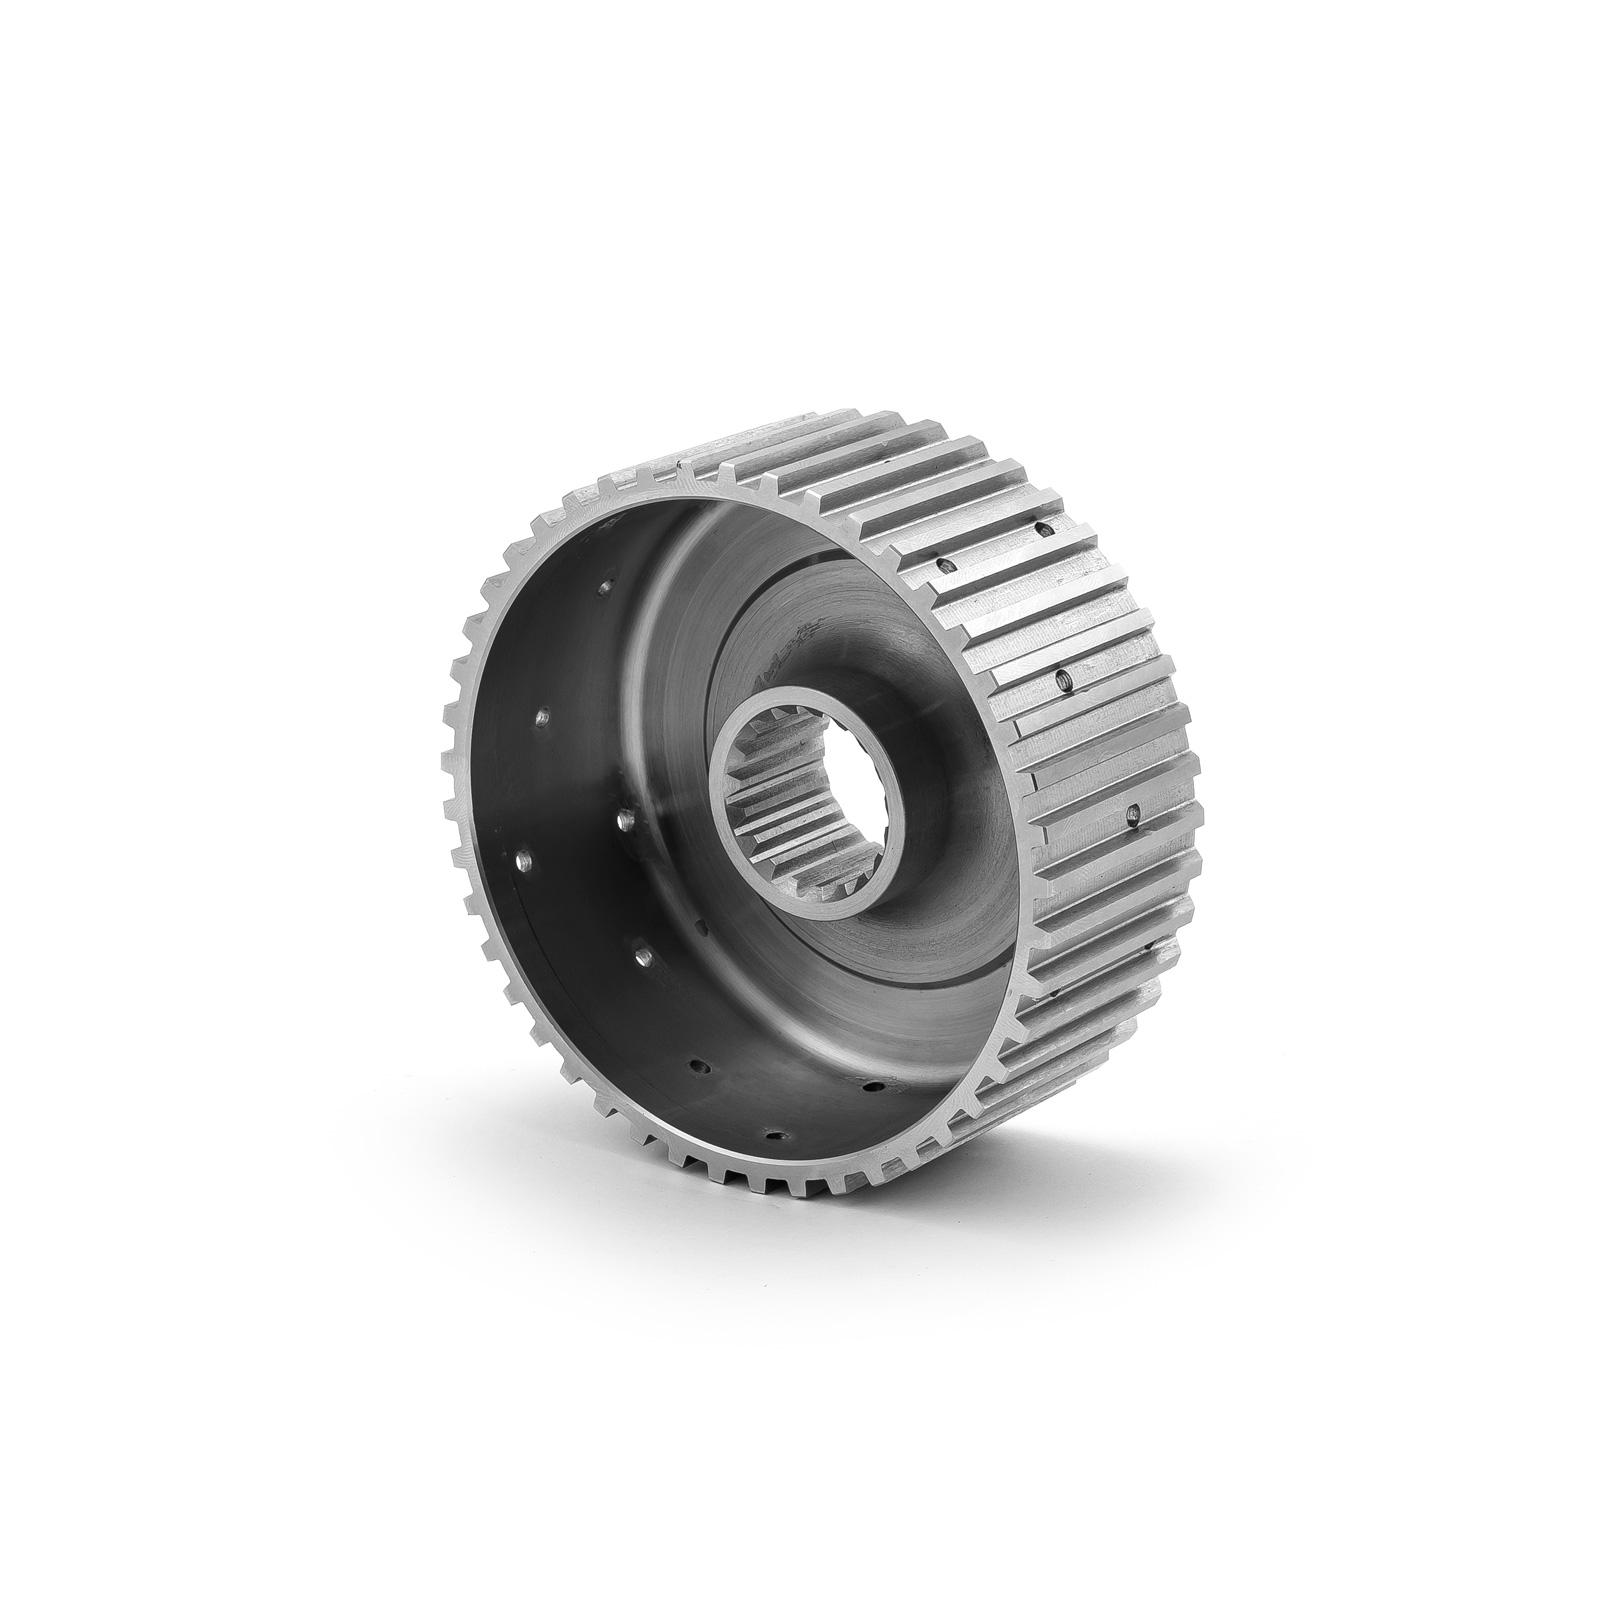 Powerglide Billet Steel Clutch Hub Fits Powerglide Clutch Drum